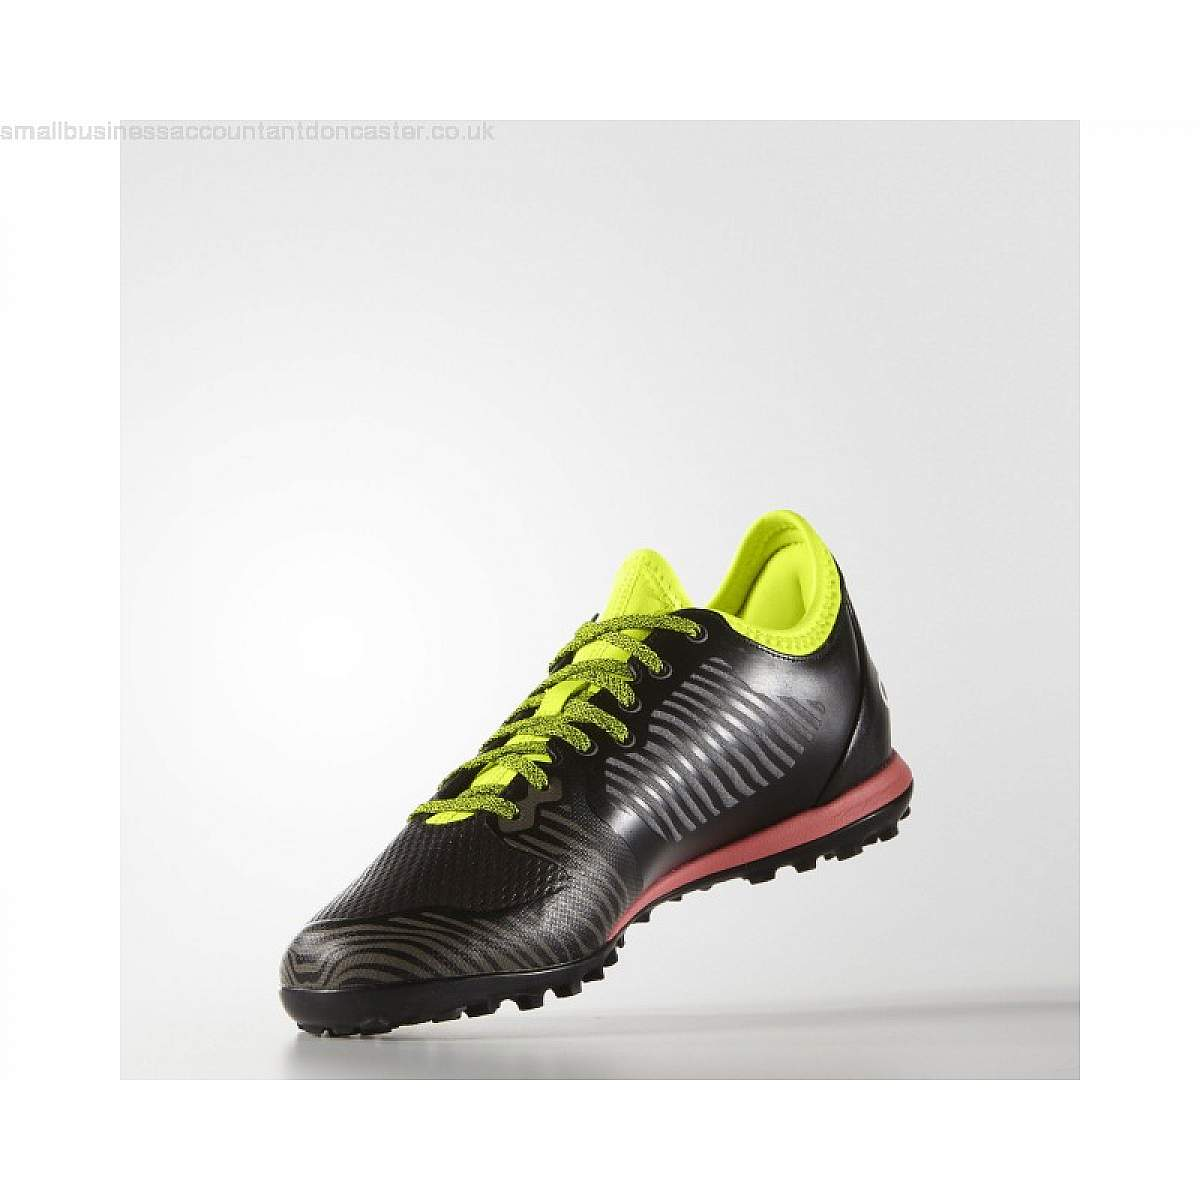 6971f7c78 Buy X 15.1 CG Men's Soccer Cleats - Black Online | La Rue Cambodia